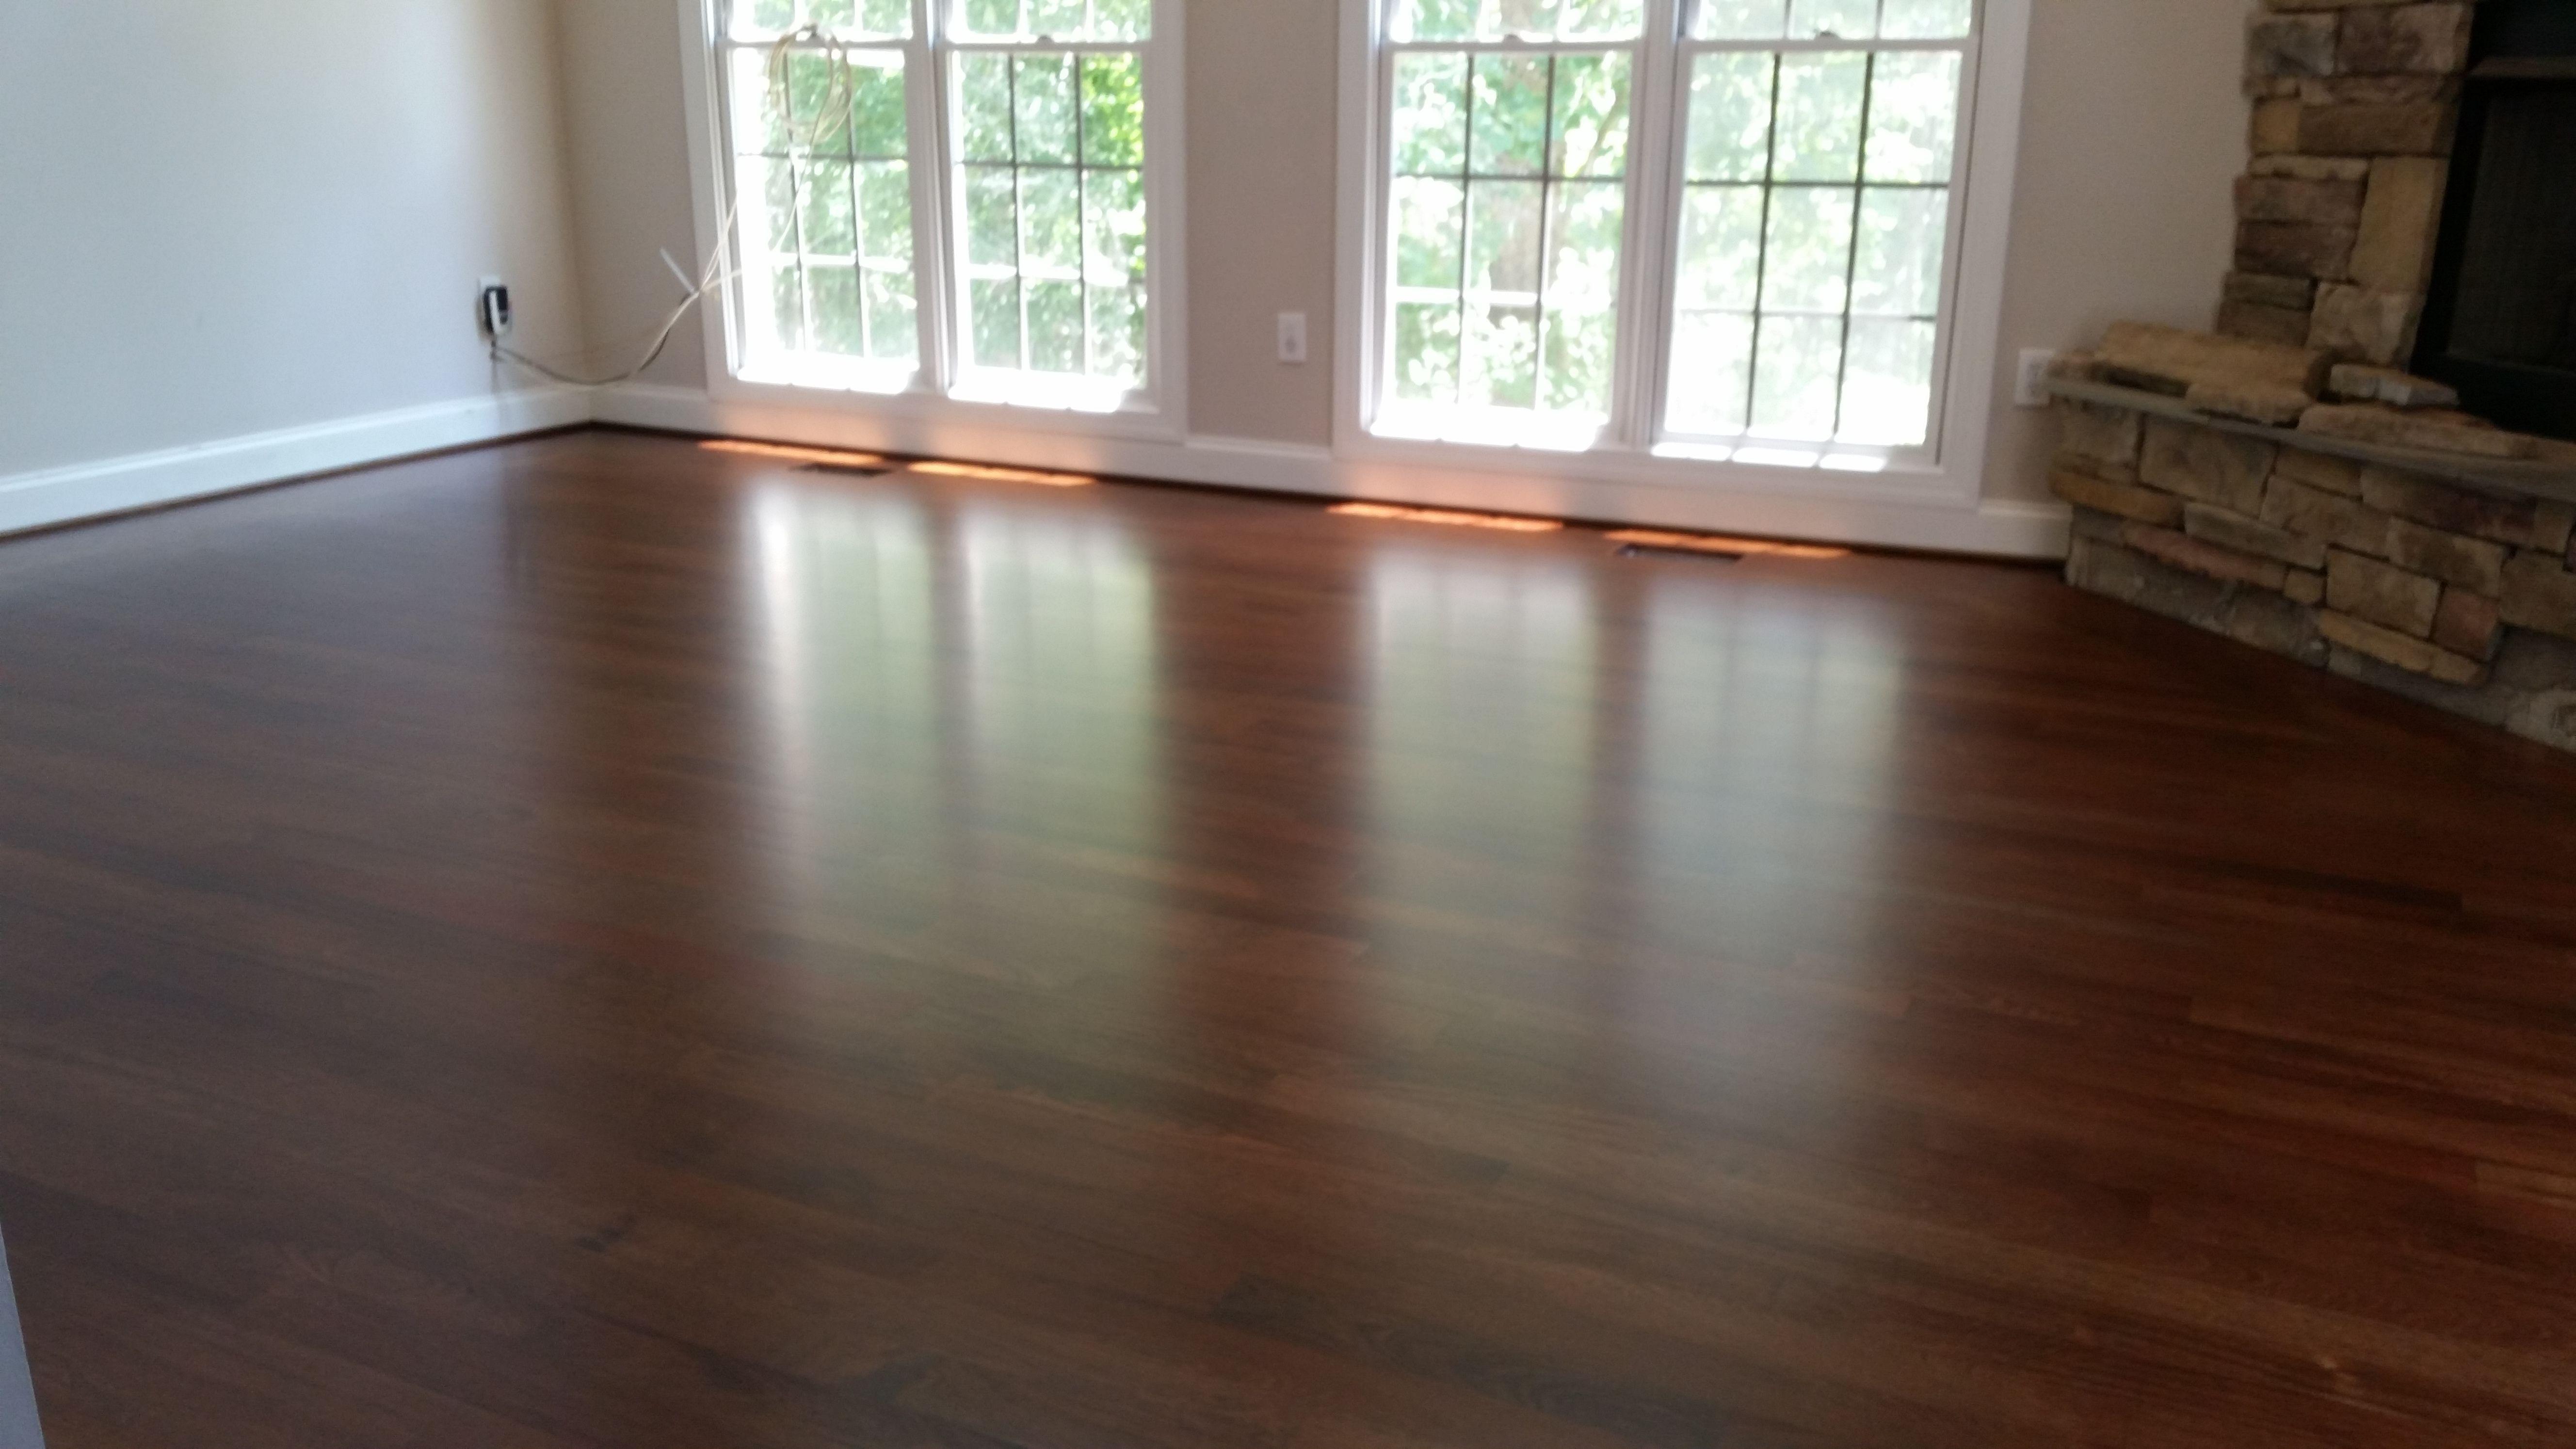 Brazilian ebony hardwood flooring - Jacobean Stain On Brazilian Cherry Hardwood Floors